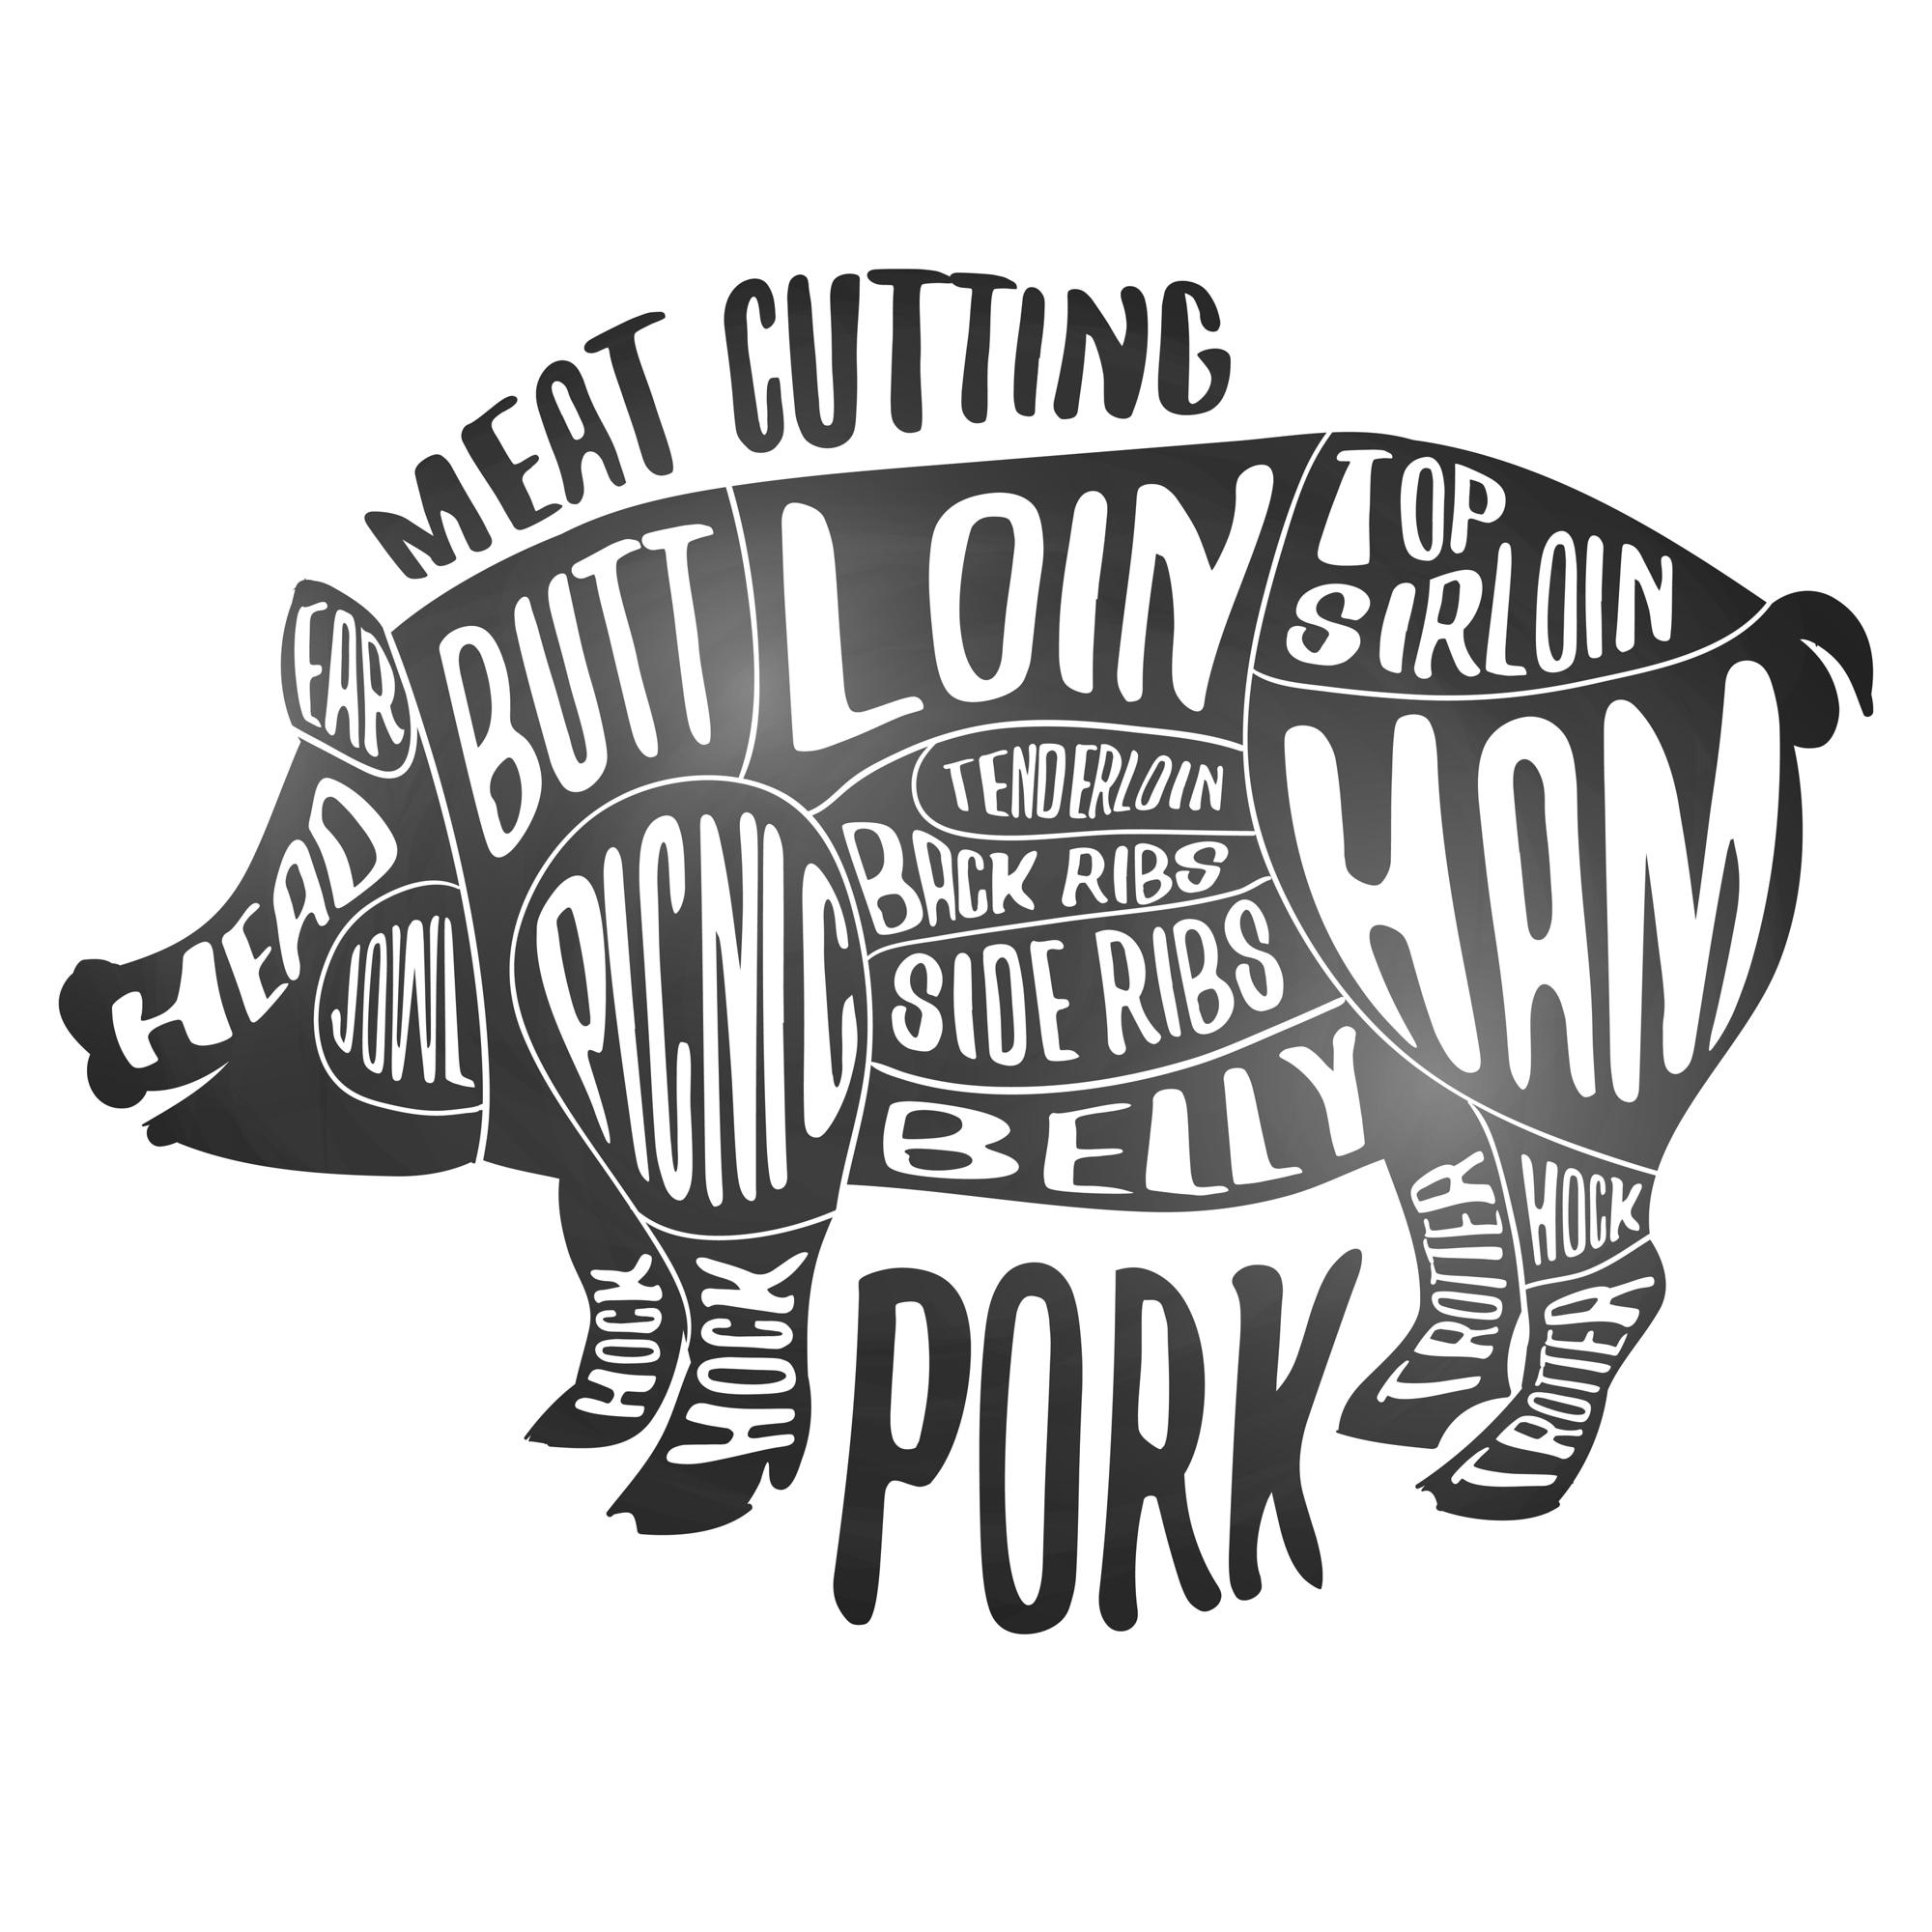 Pork parts: the difference between pork loin and pork tenderloin.